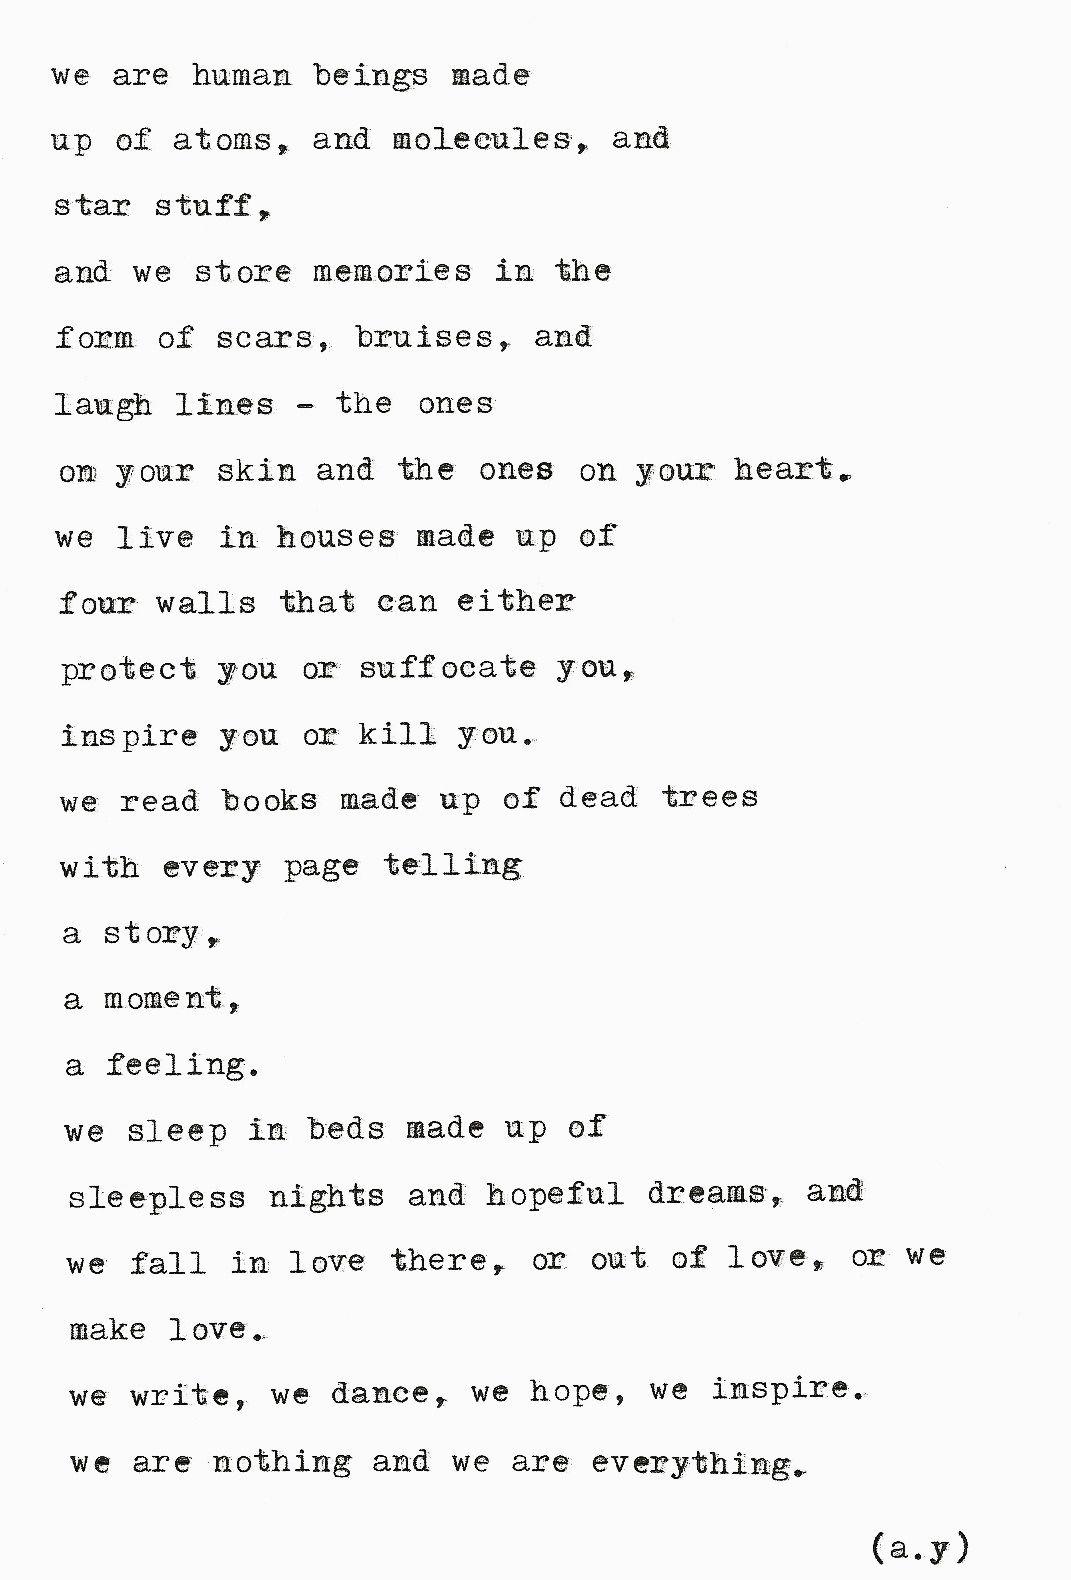 masataka takayanagi relationship poems